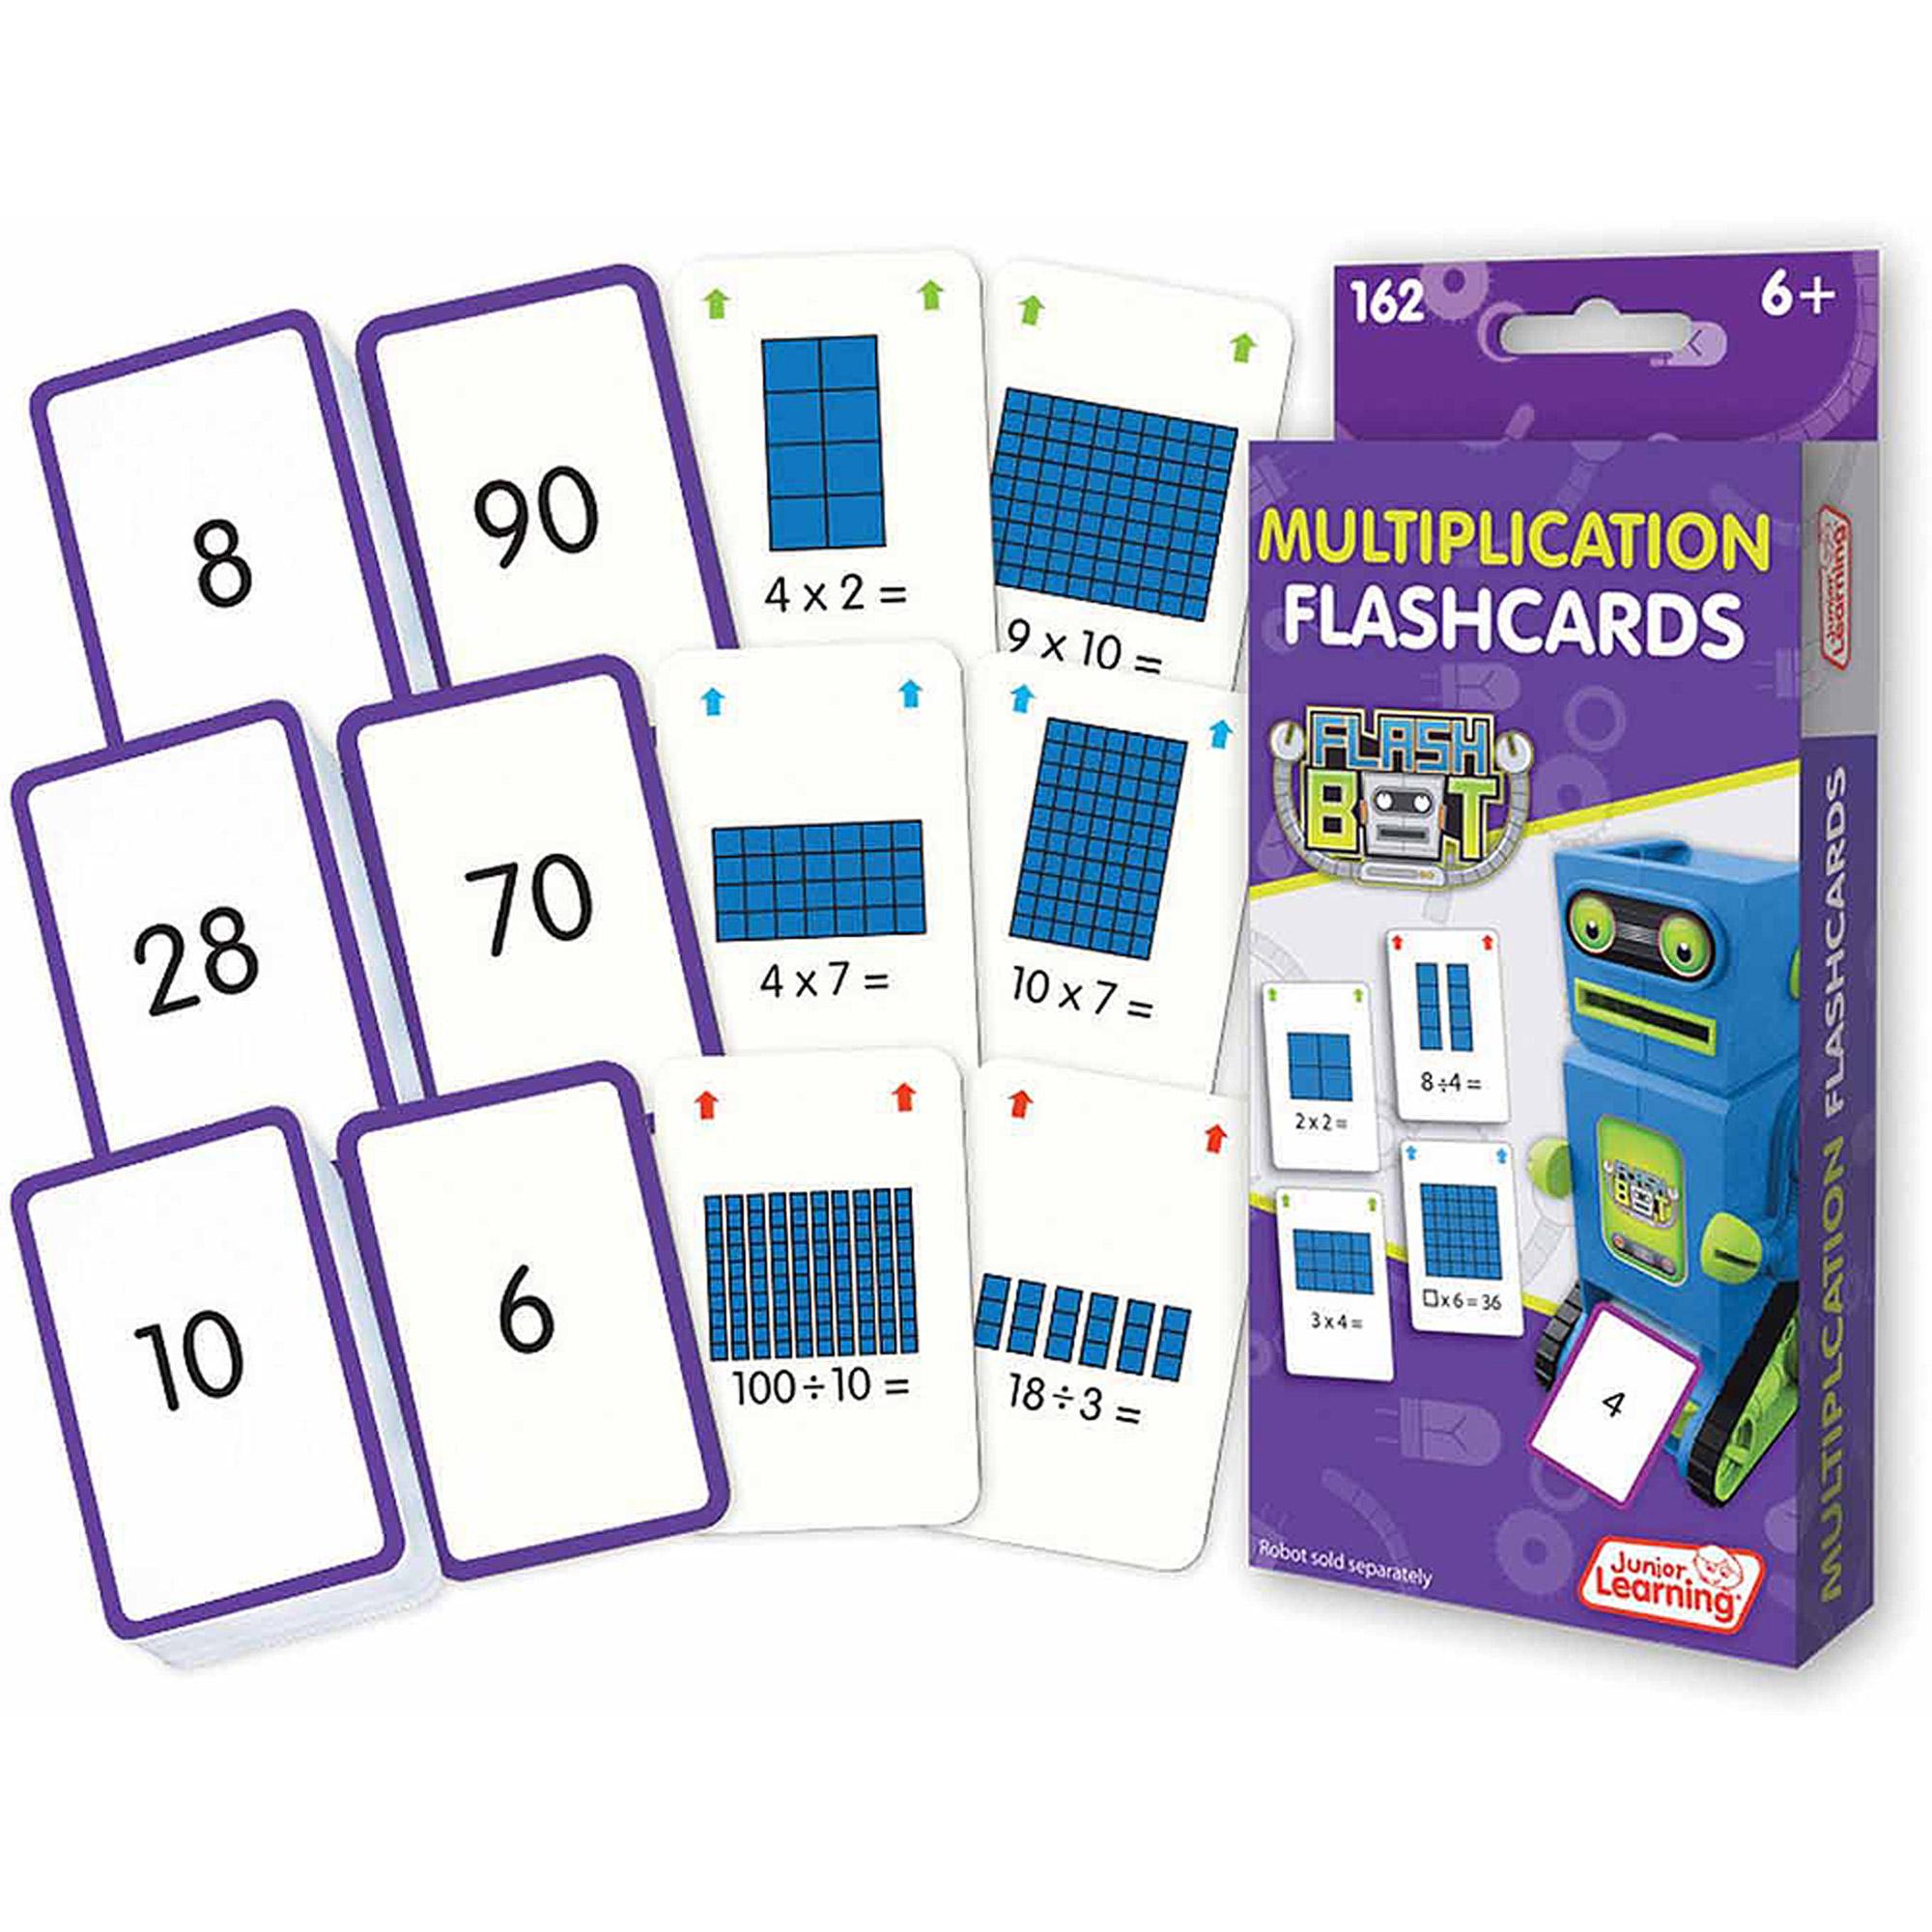 Junior Learning Multiplication Flashcards - Walmart